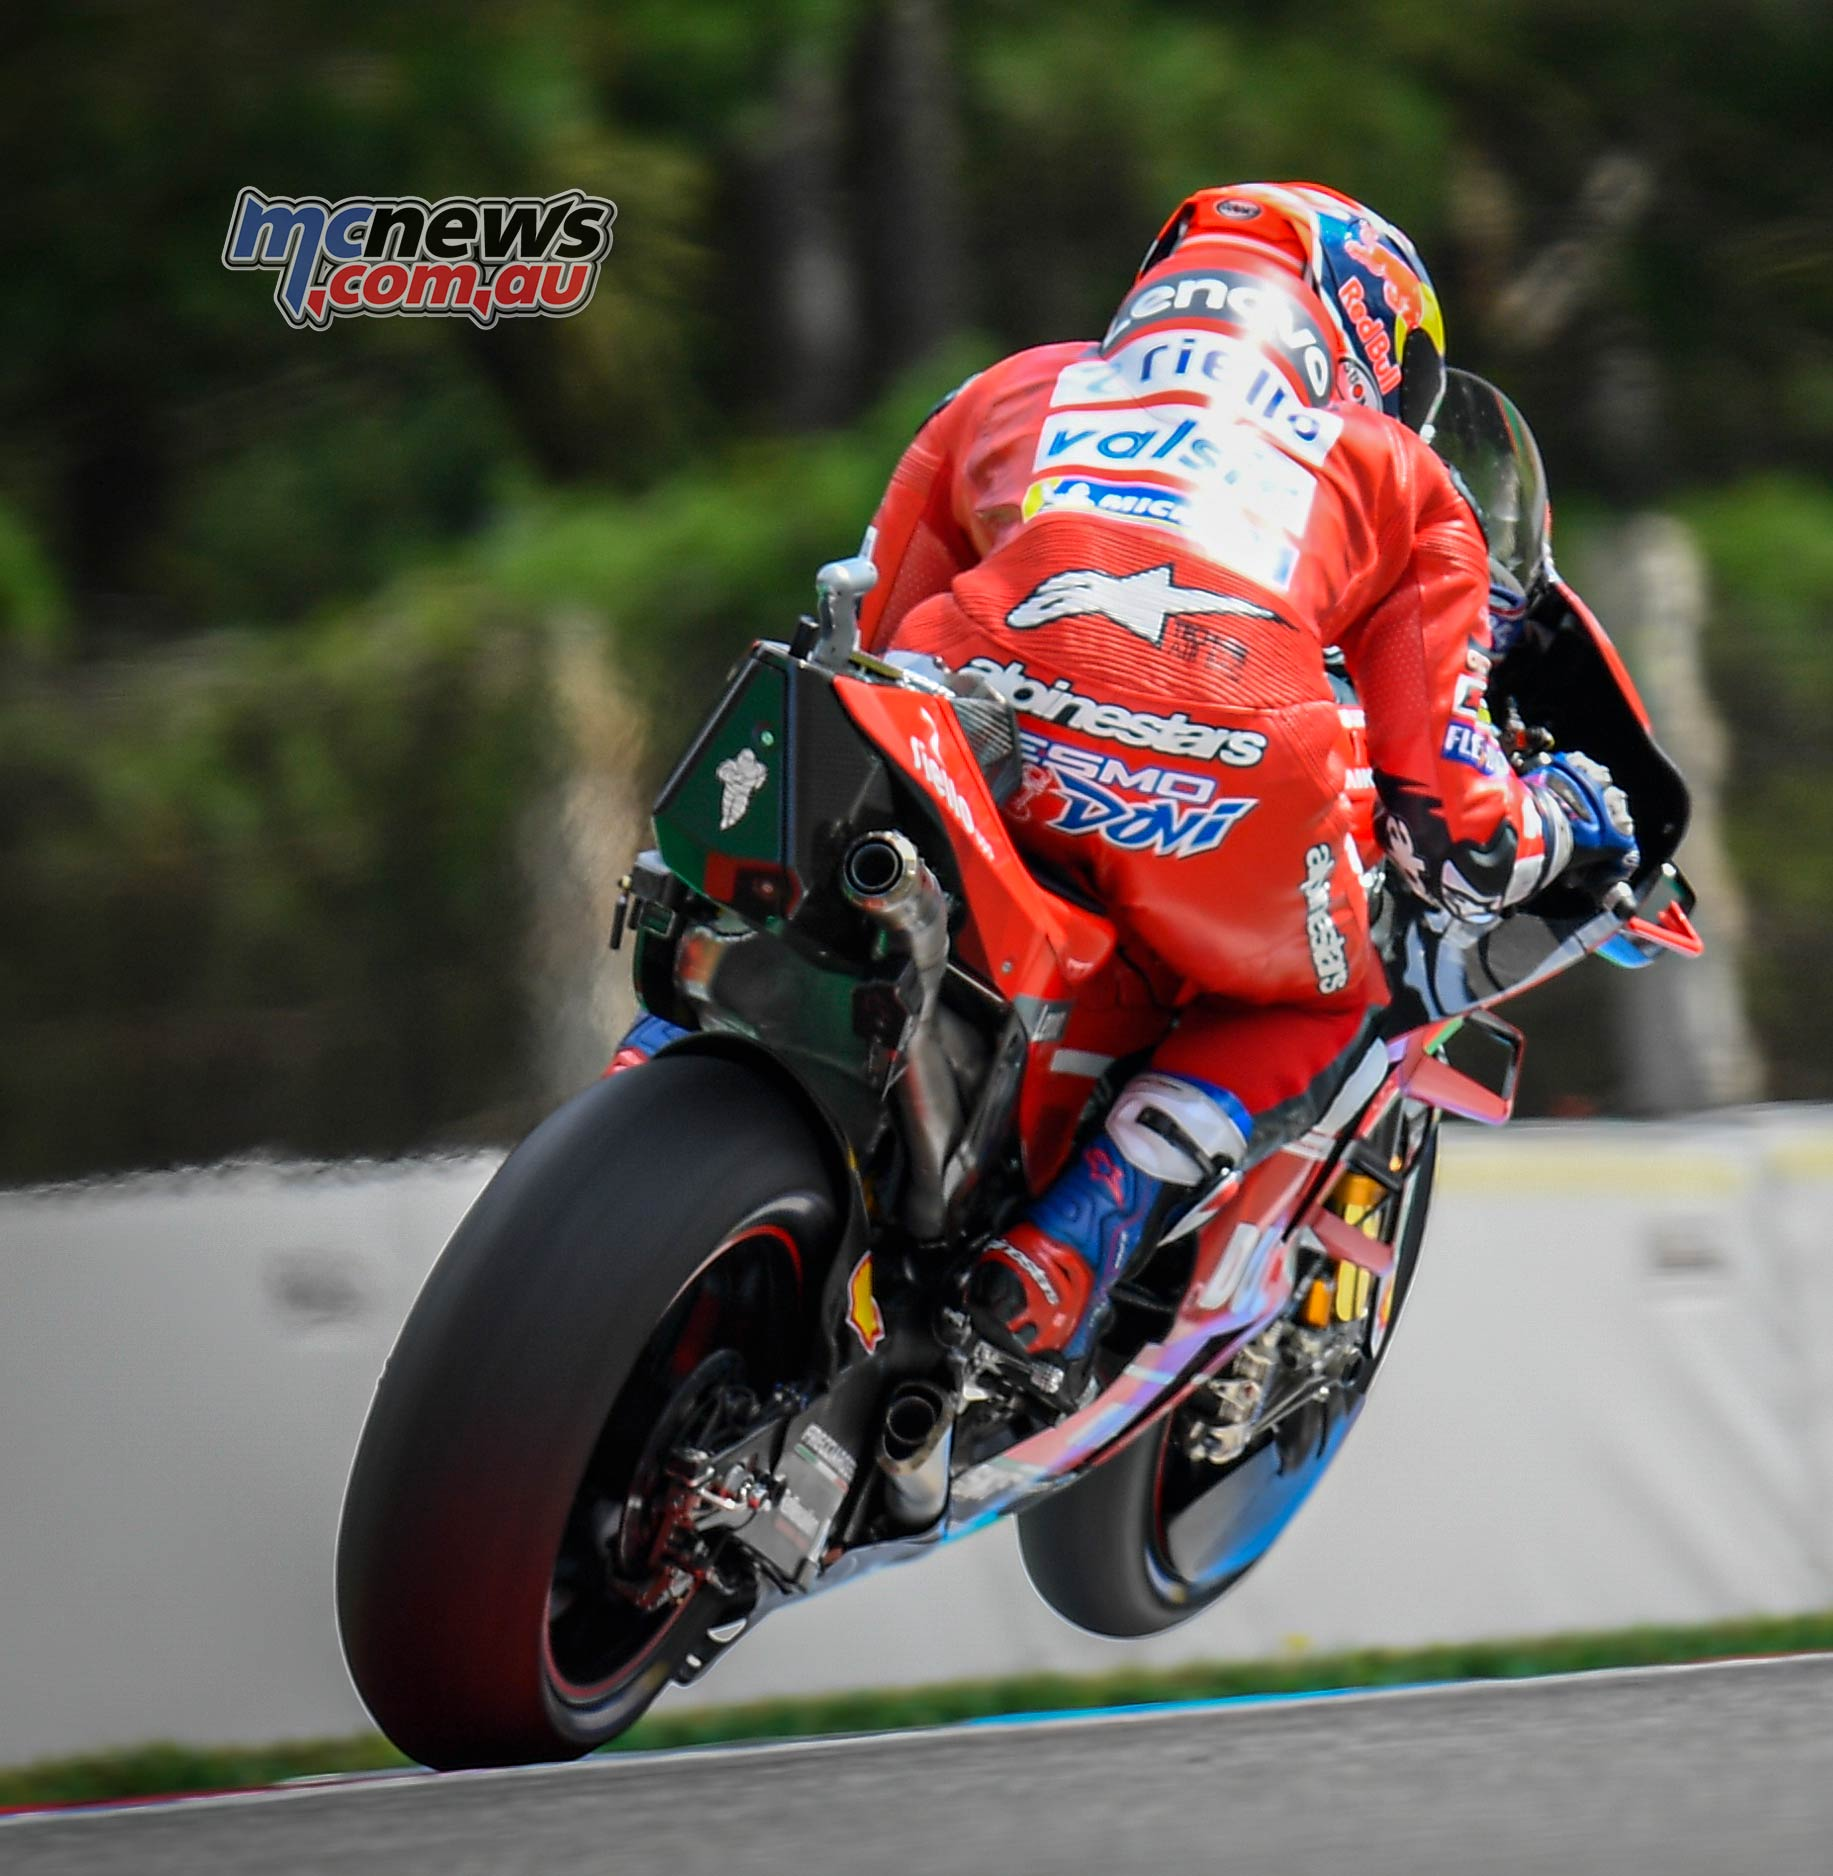 MotoGP Round Brno Fri Dovizioso